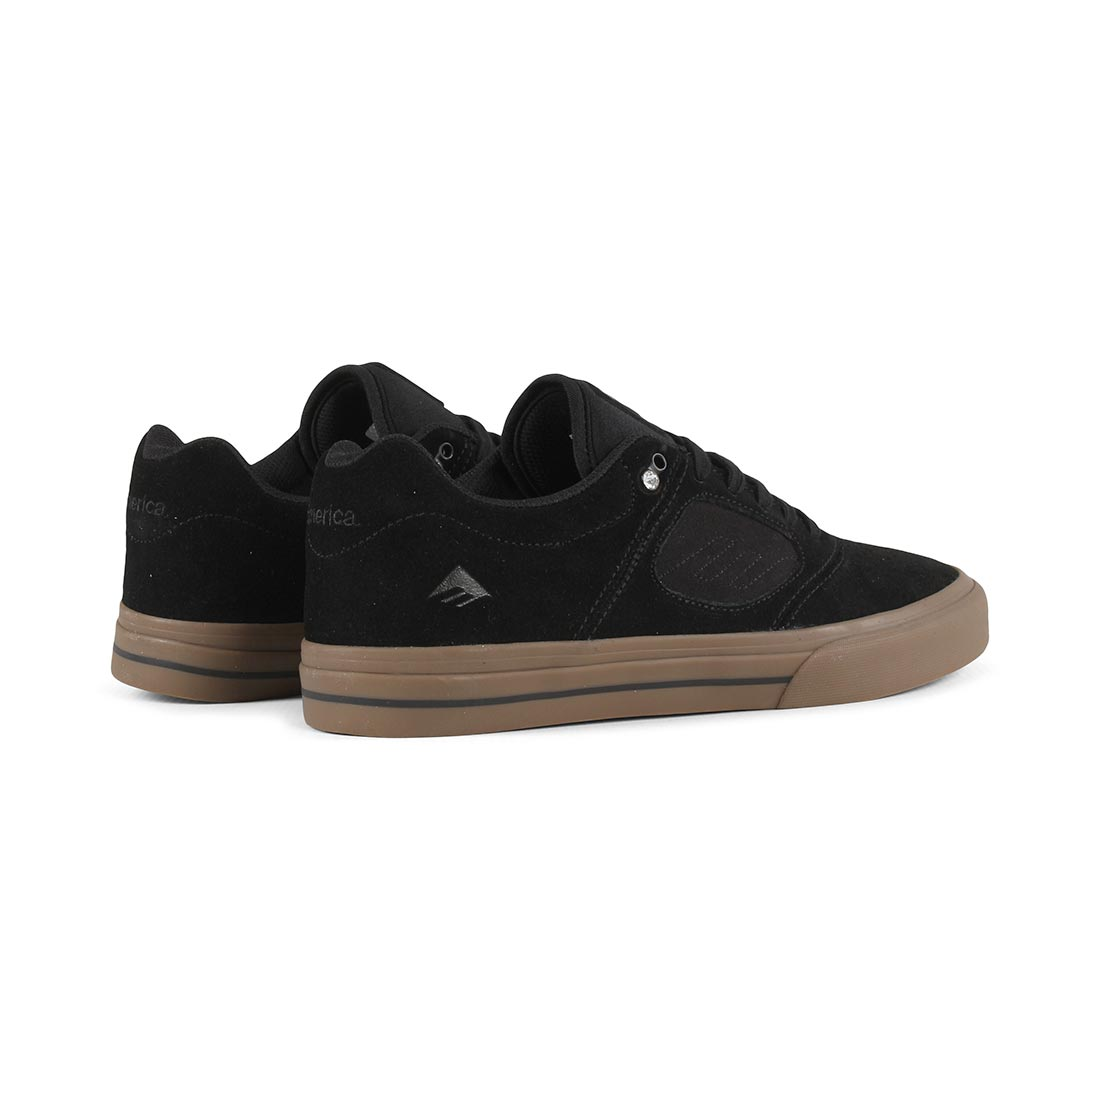 Emerica Reynolds 3 G6 Vulc Skate Shoes - olive/black/gum